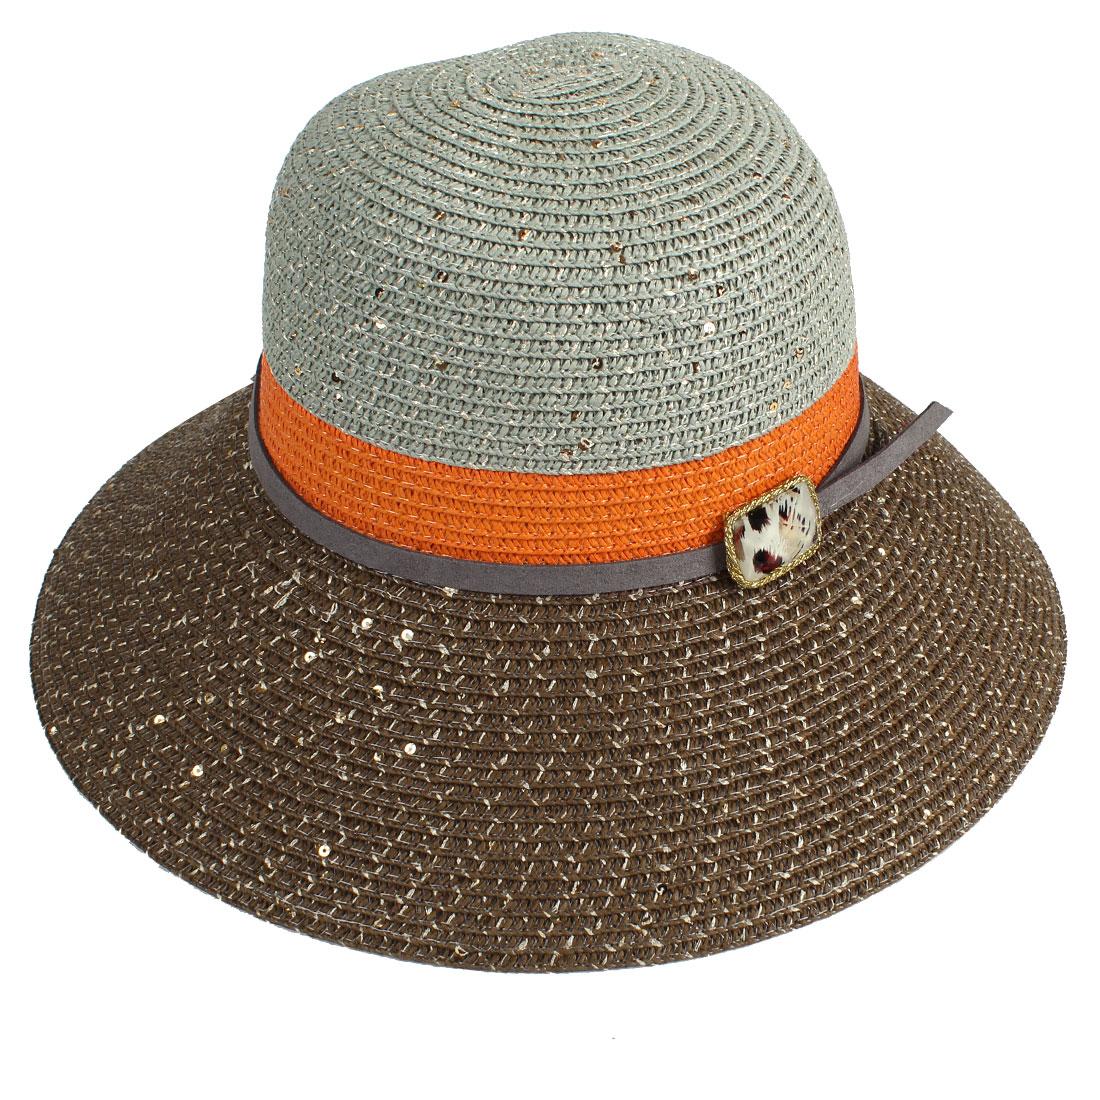 Ladies Sequins Decor Round Brim Bucket Style Beach Straw Hat Chocolate Color